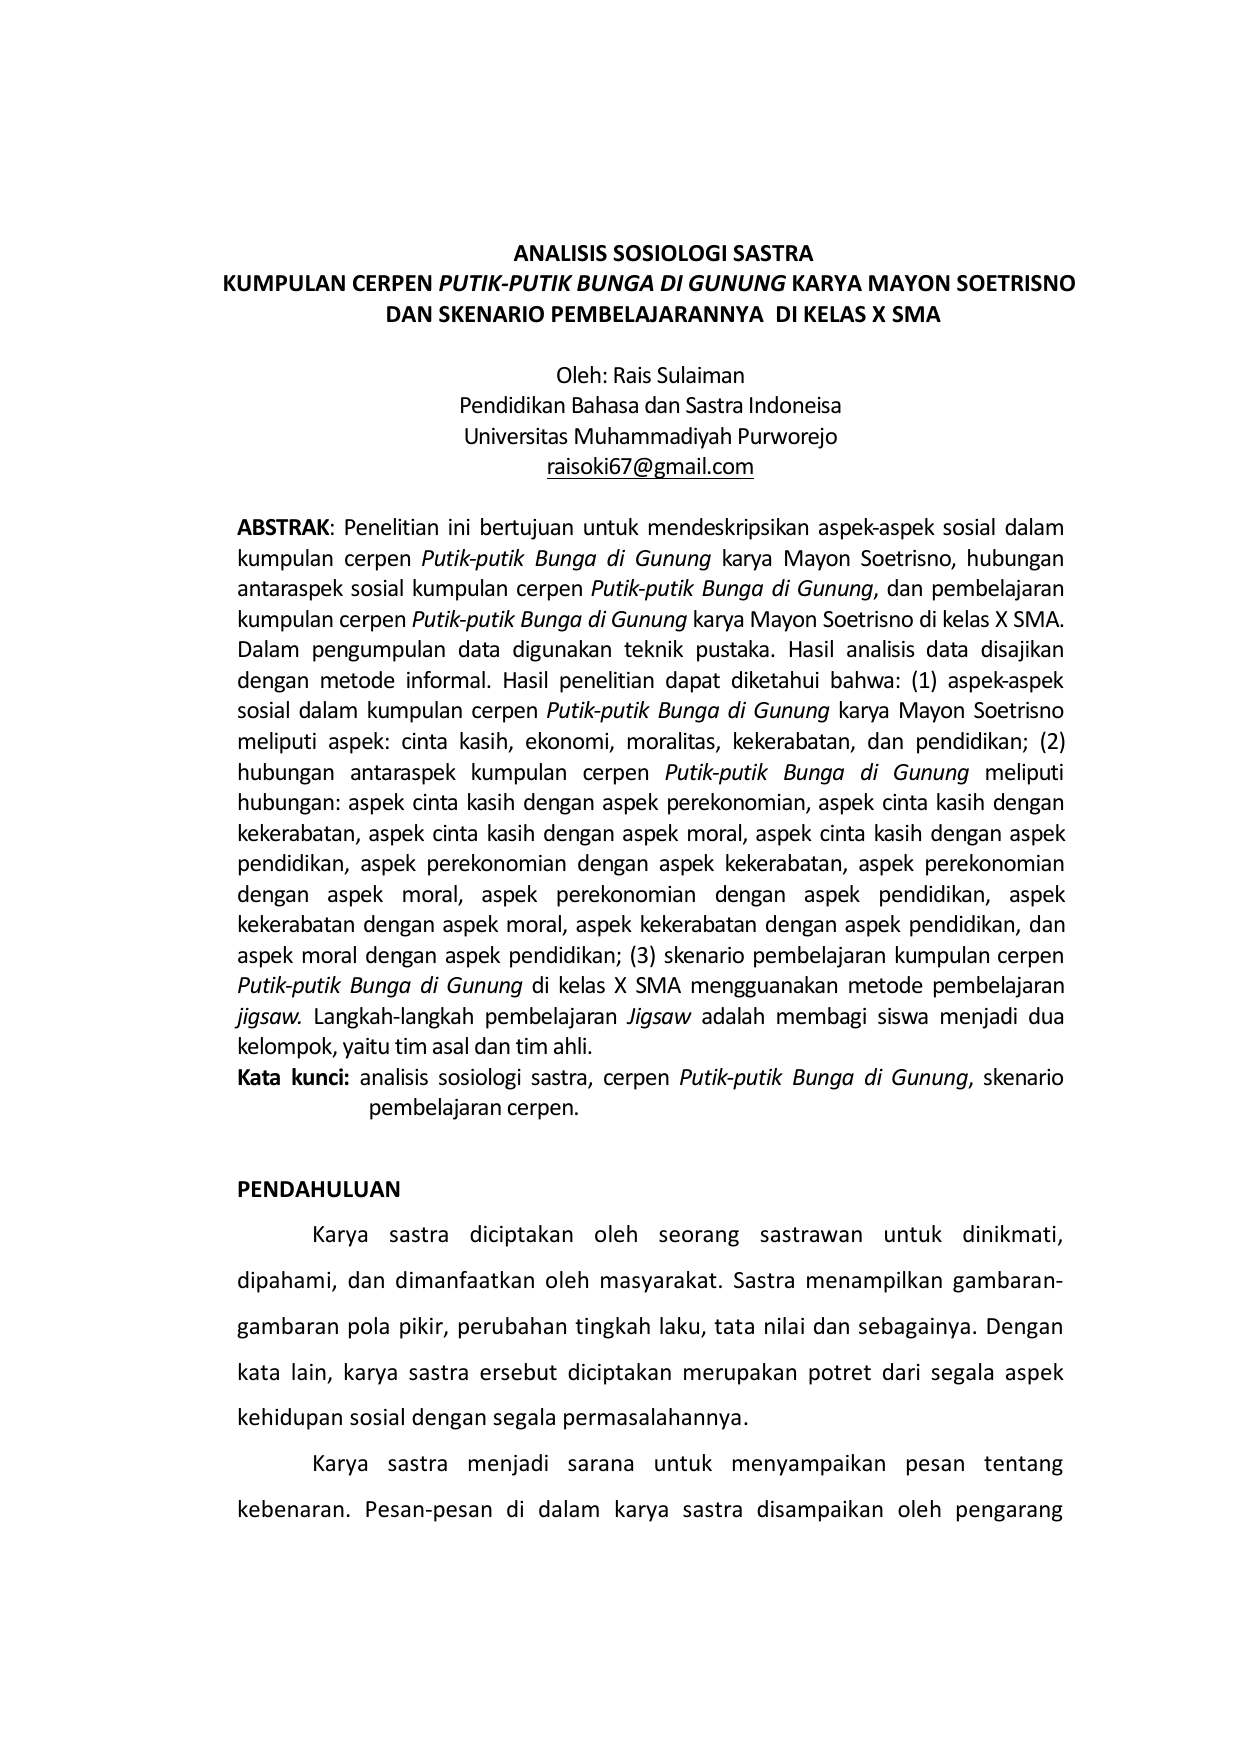 Analisis Sosiologi Sastra Kumpulan Cerpen Putik